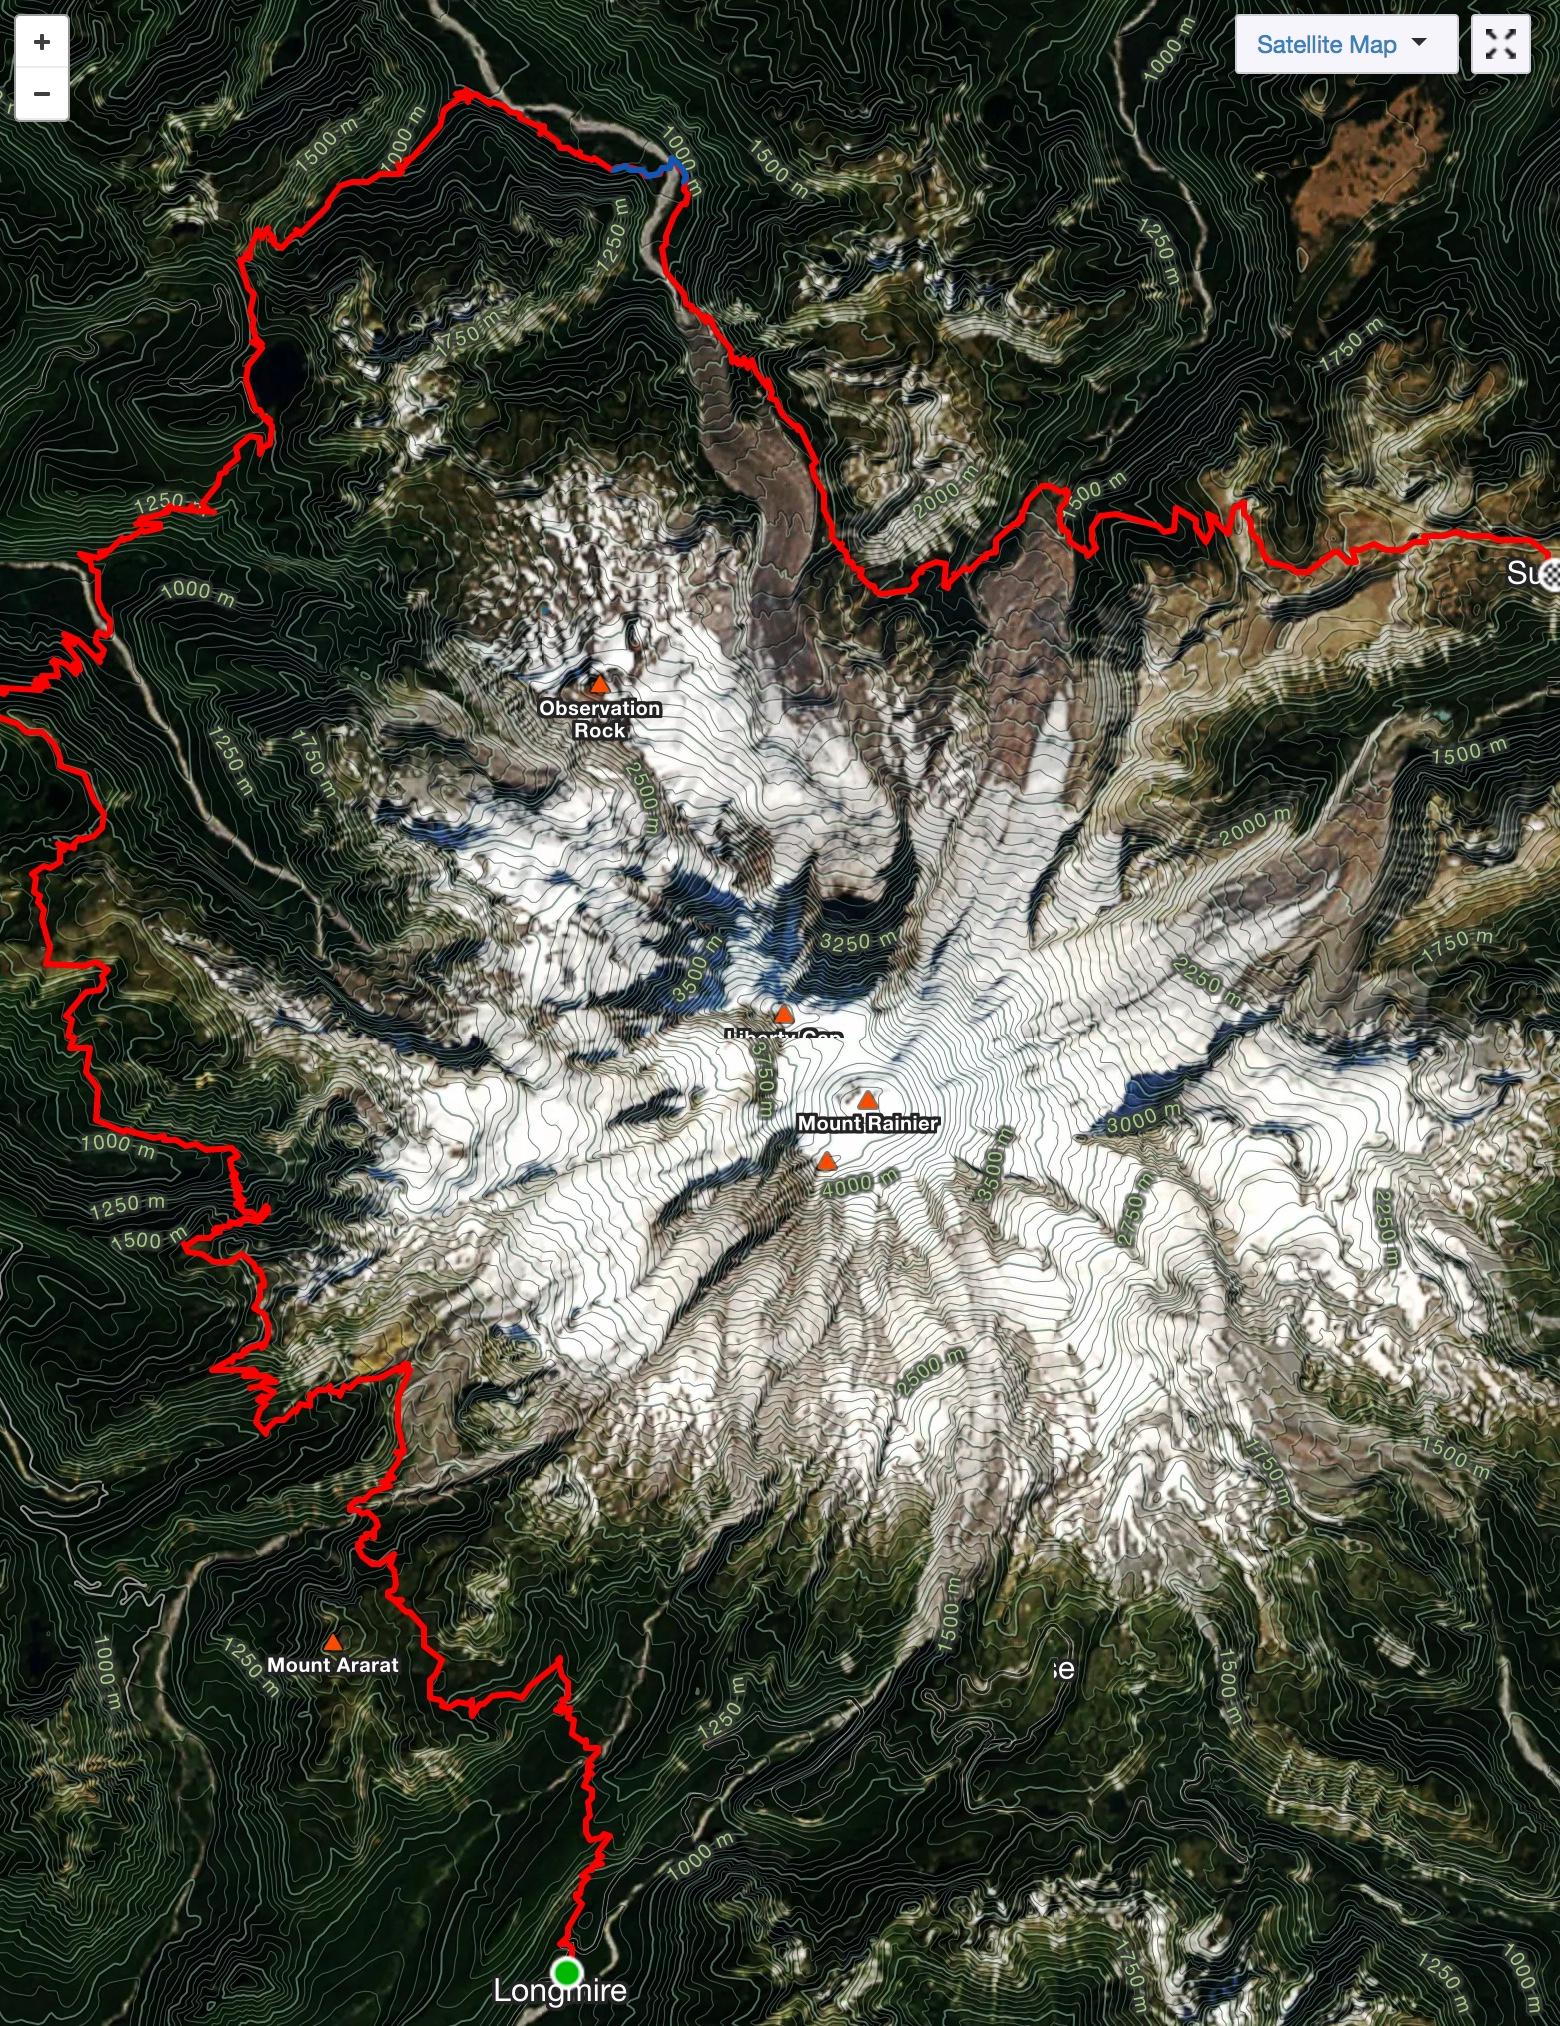 Strava map showing 57 mile Wonderland section